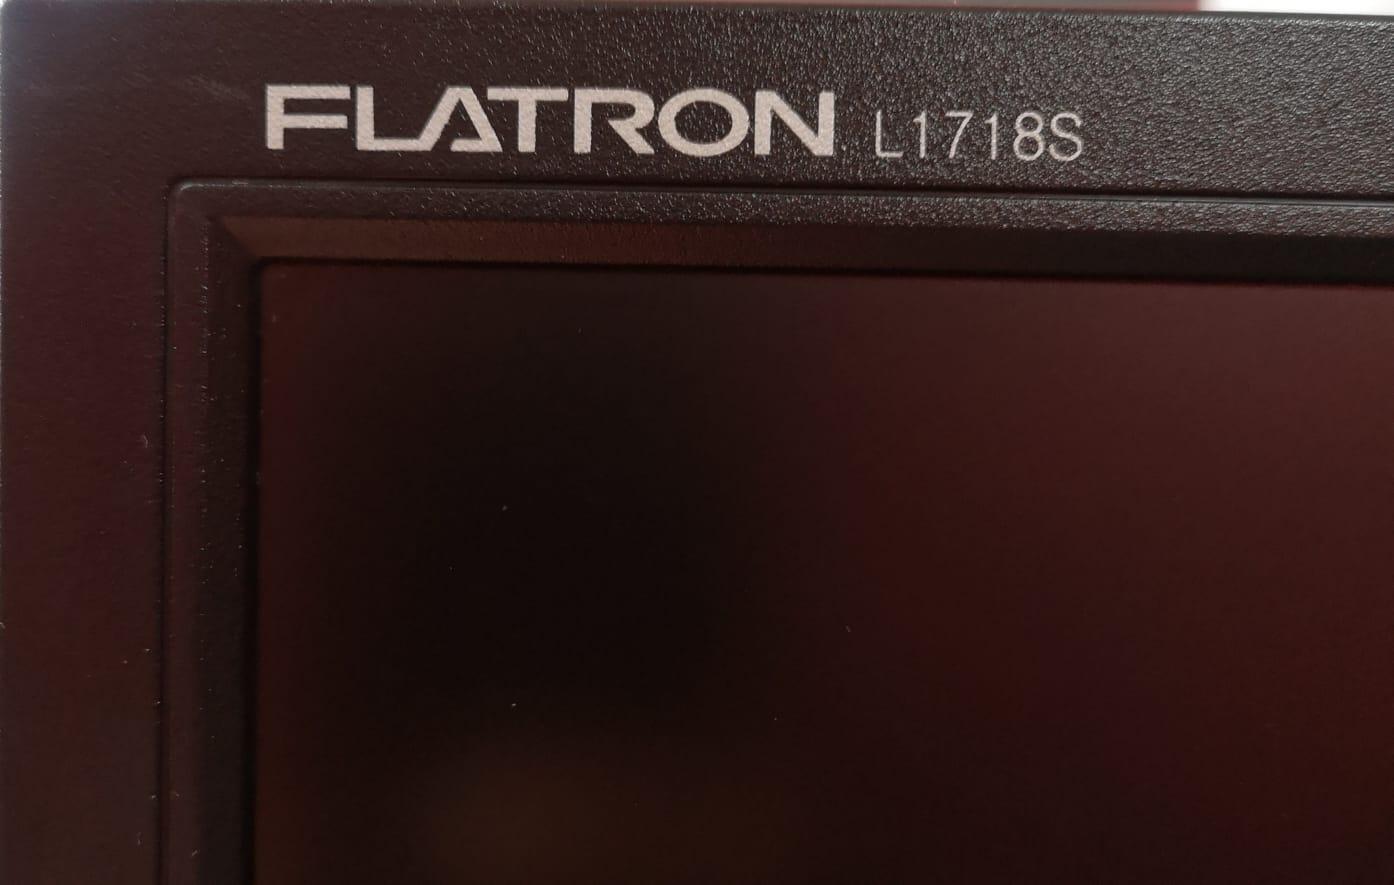 LG Flatron 17 Inch LCD Monitor